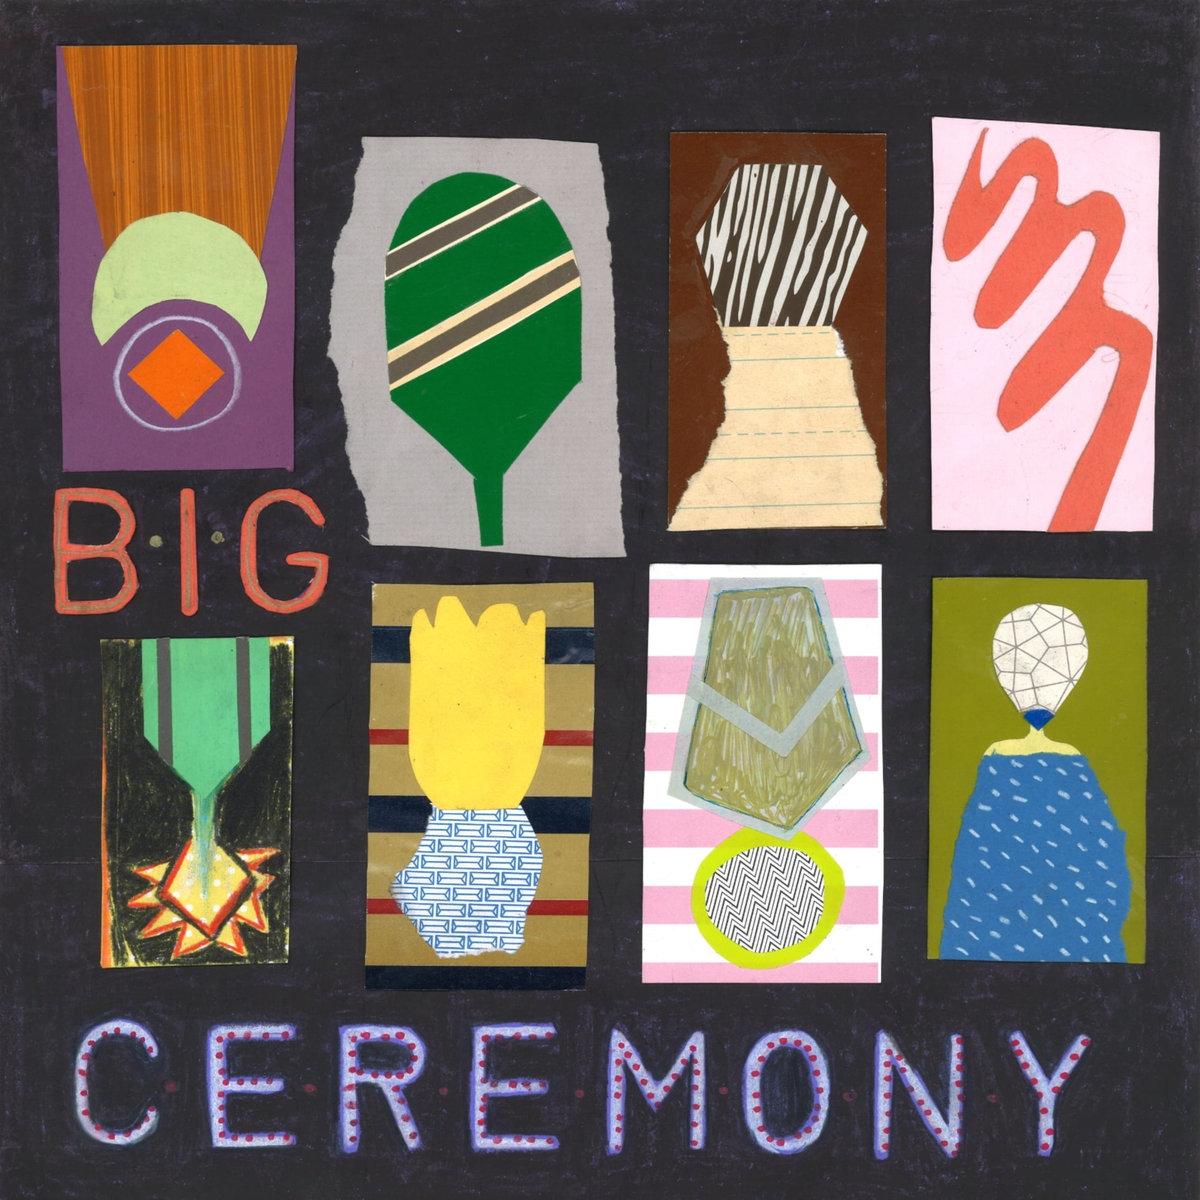 Review: Big Ceremony – Big Ceremony EP